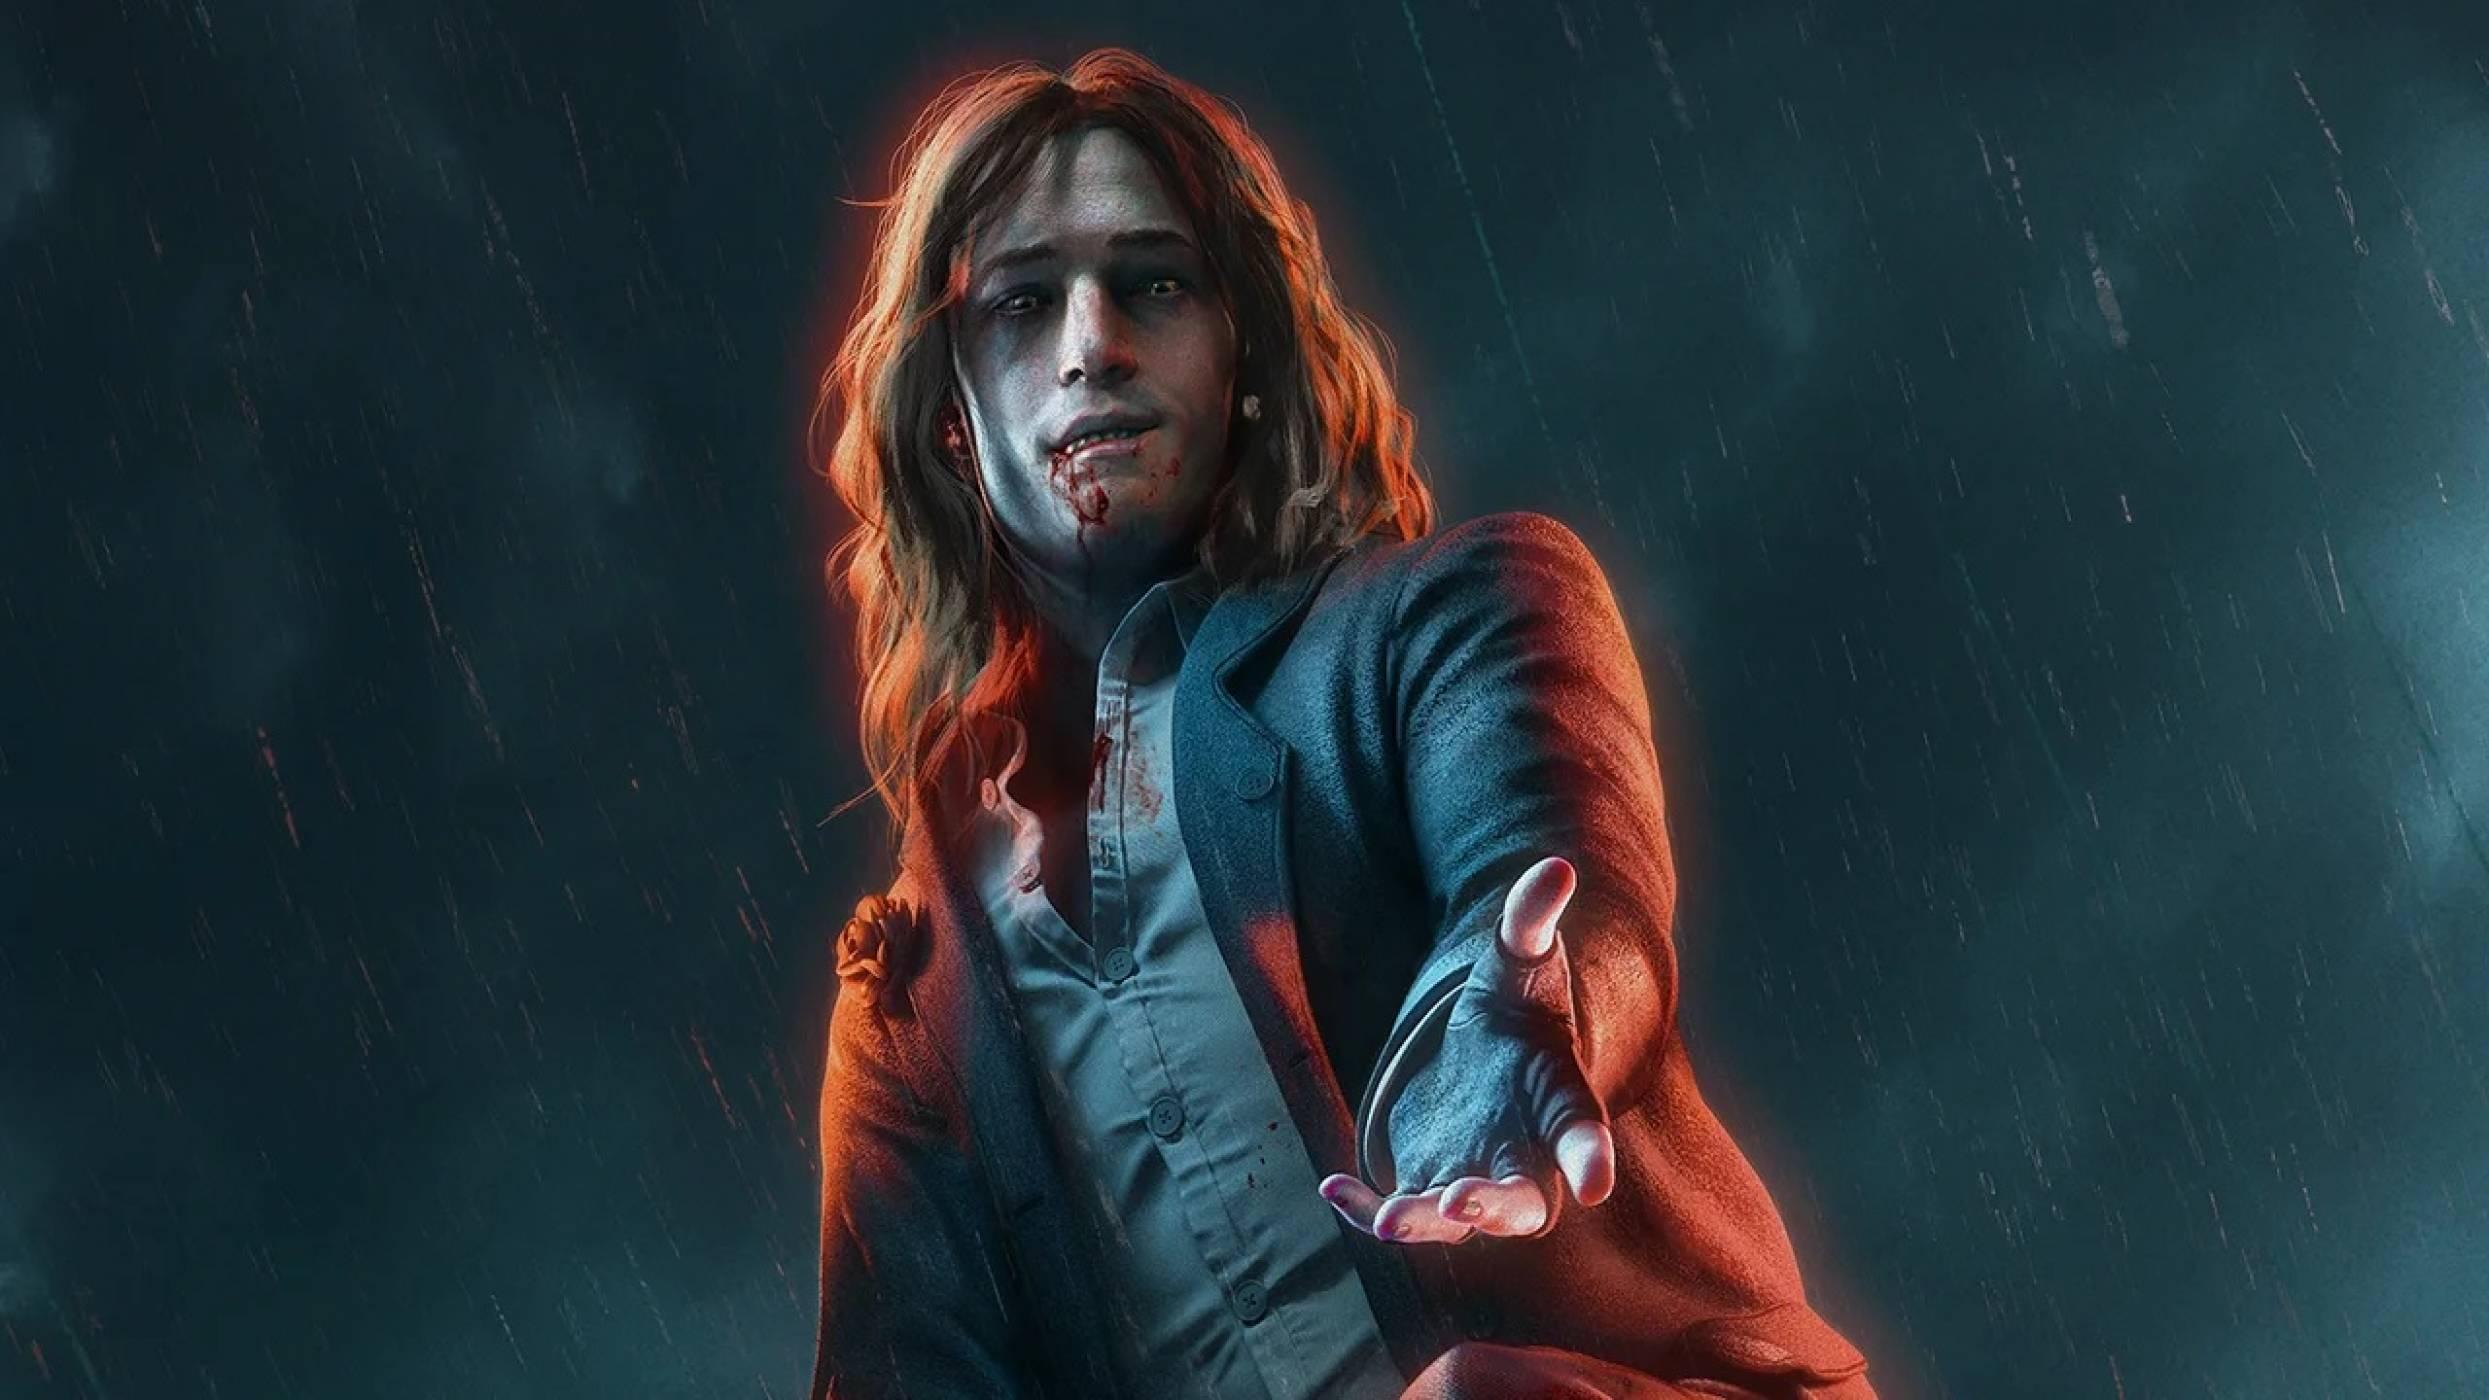 Vampire The Masquerade – Bloodlines 2 ще бъде налична за всички и навсякъде